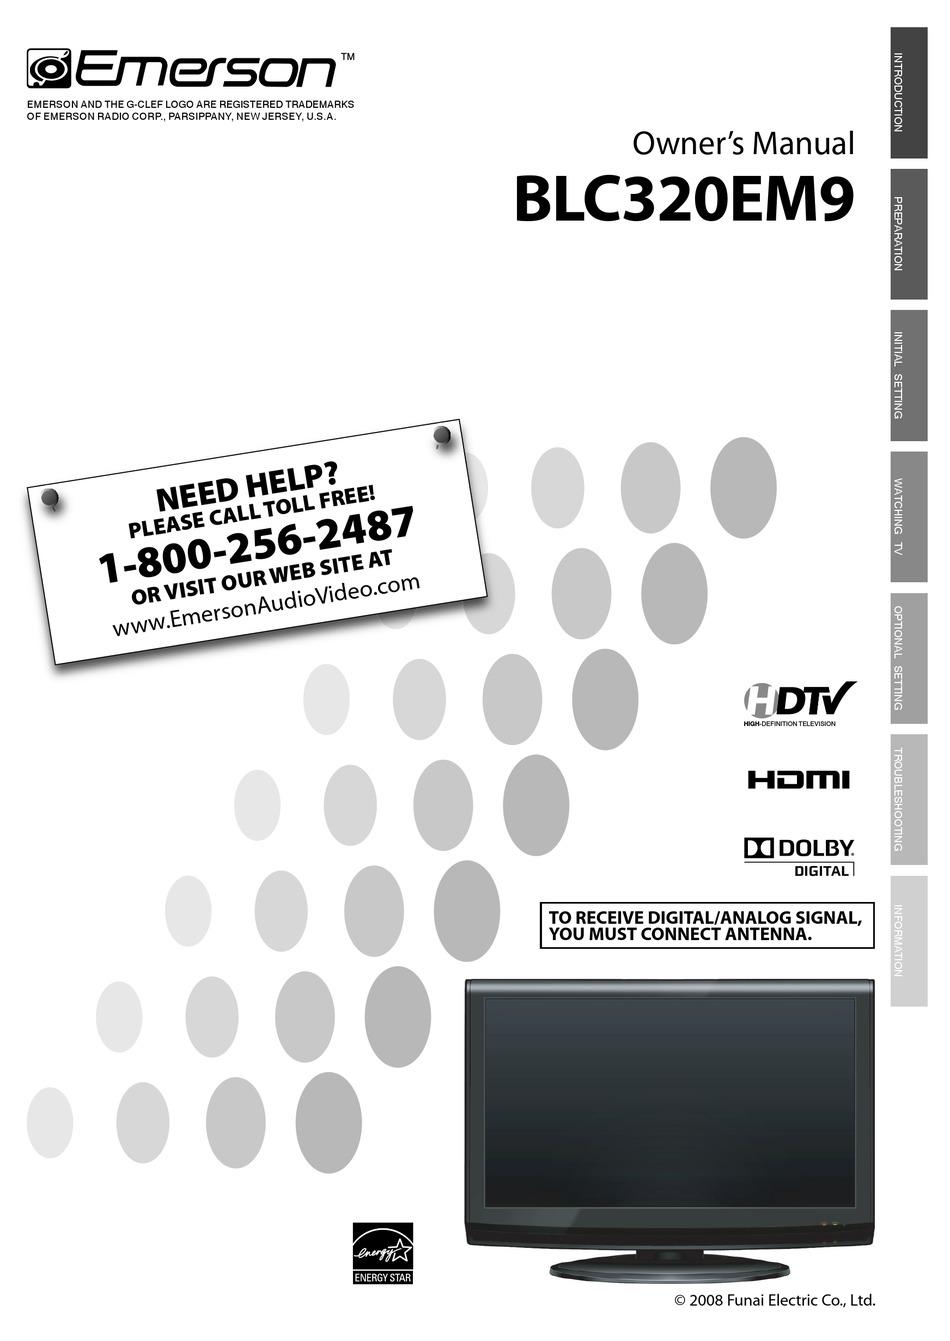 Emerson Lcd Tv Blc320em9 Owner S Manual Pdf Download Manualslib